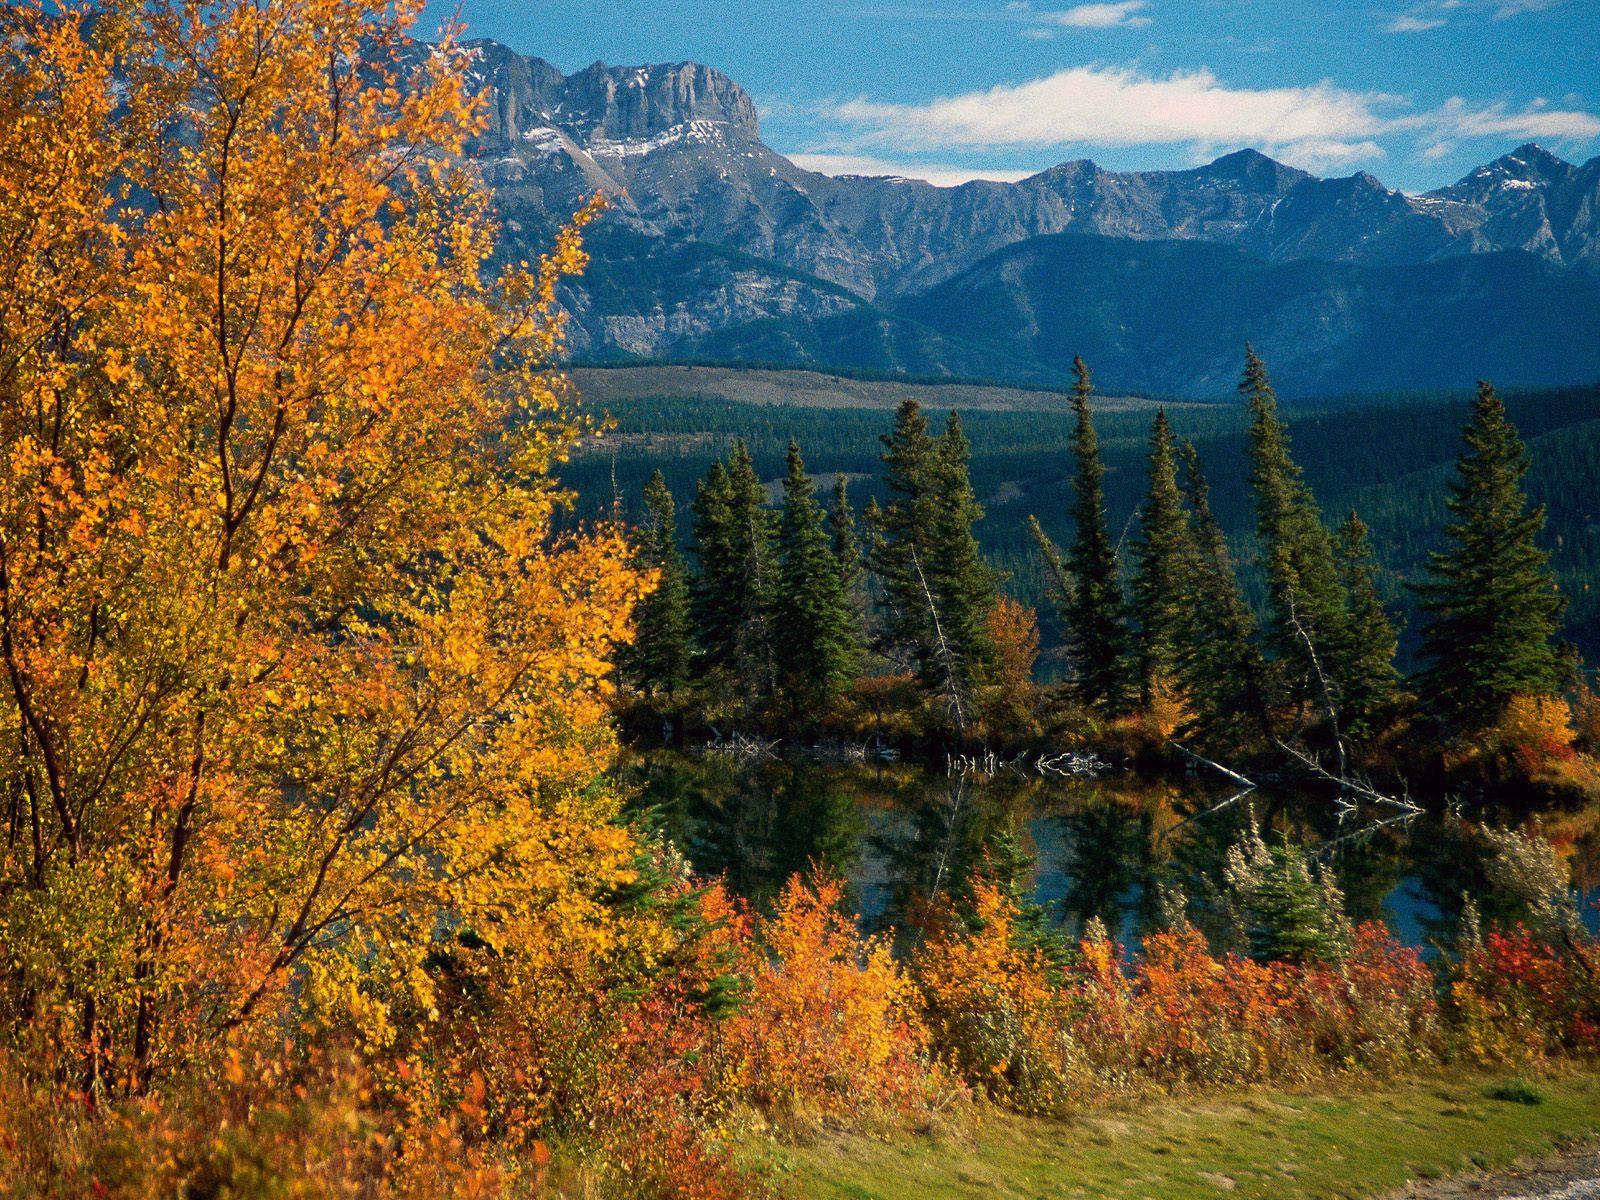 http://2.bp.blogspot.com/-y3iSZ9yT2Nk/TfrjtcOcLFI/AAAAAAAAFLE/cAyGS6ml_oU/s1600/Canada%2B%252828%2529.jpg